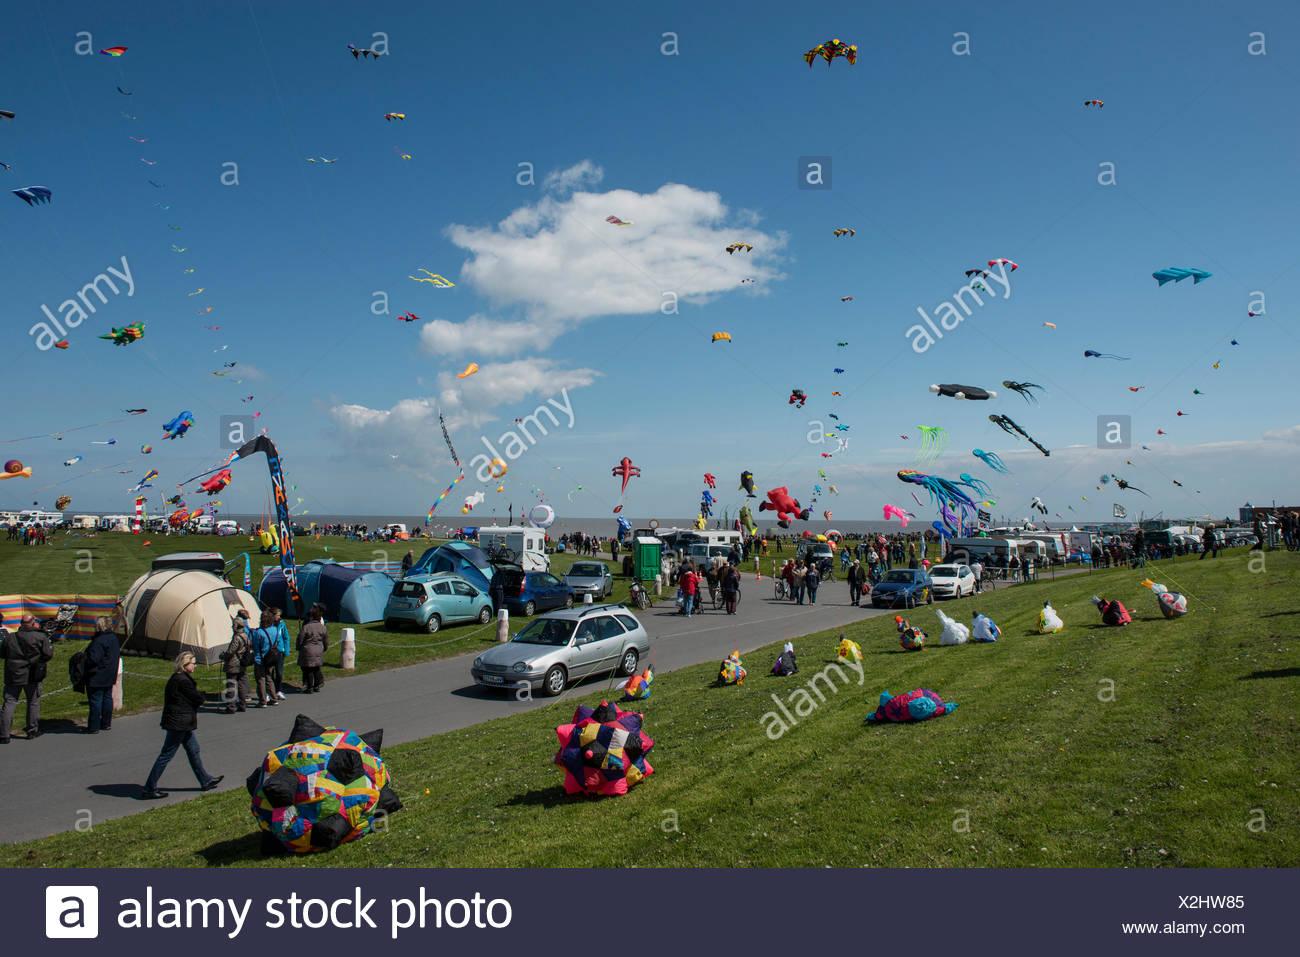 International Drachenfest kite festival, Norddeich, East Frisia, Lower Saxony - Stock Image